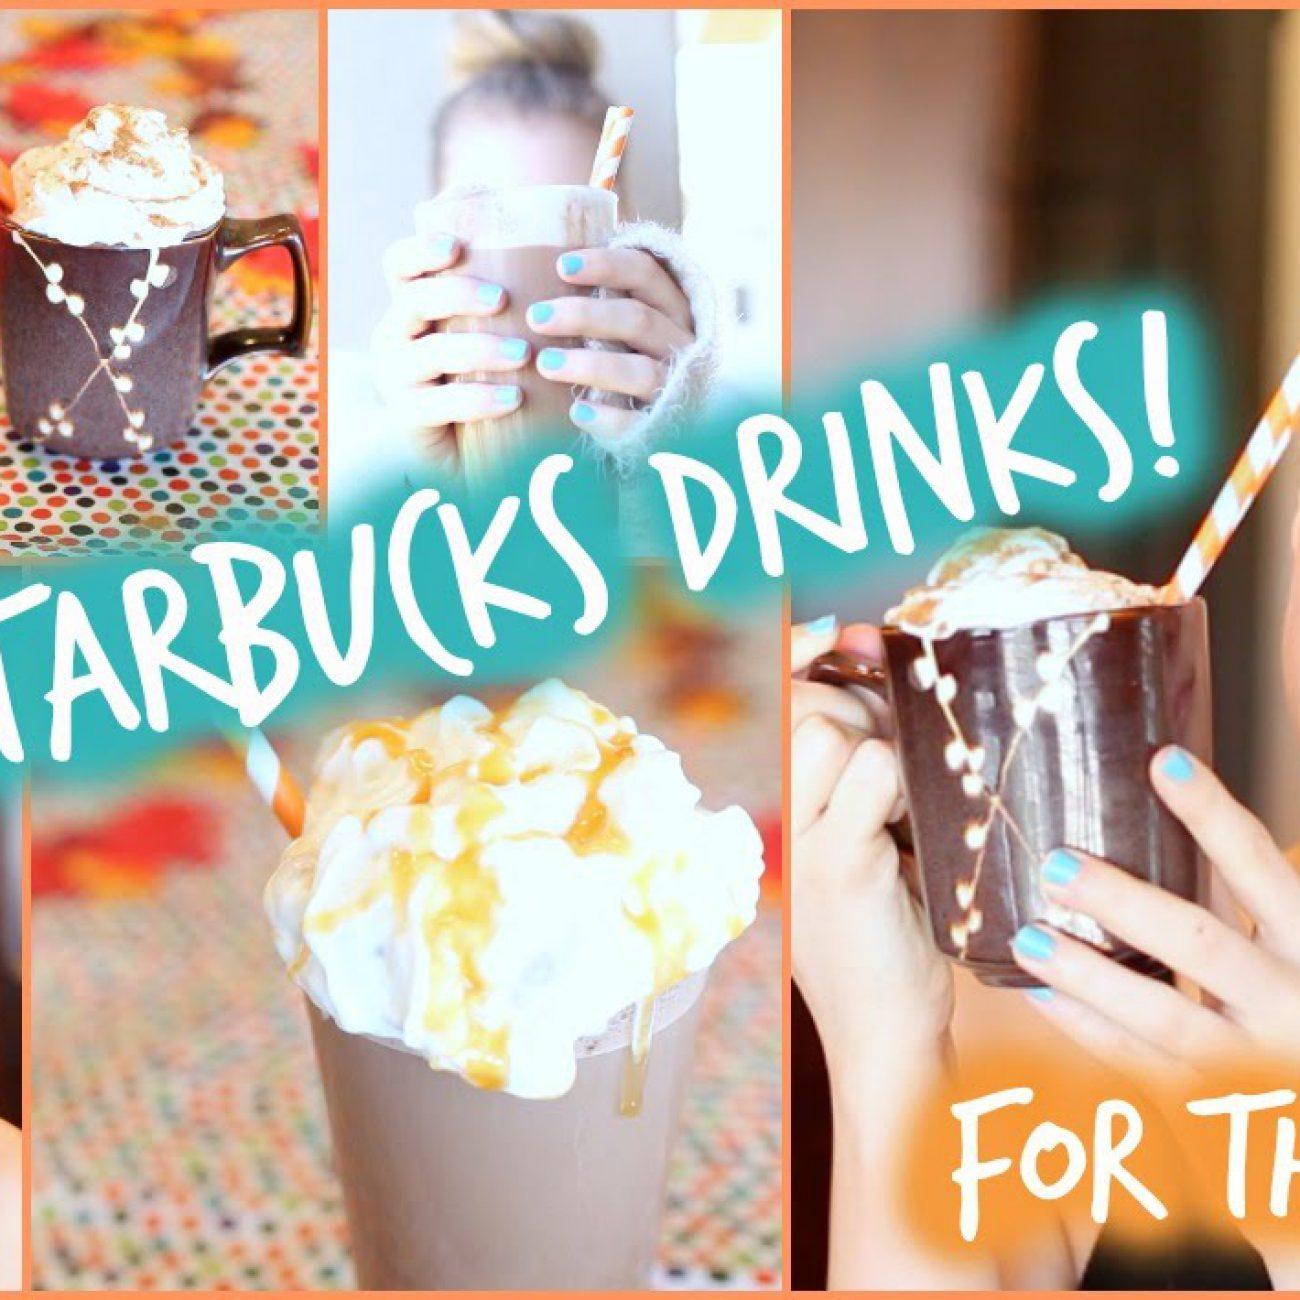 DIY Fall Starbucks Drinks: Pumpkin Spice & Salted Caramel!🍂 | Aspyn Ovard